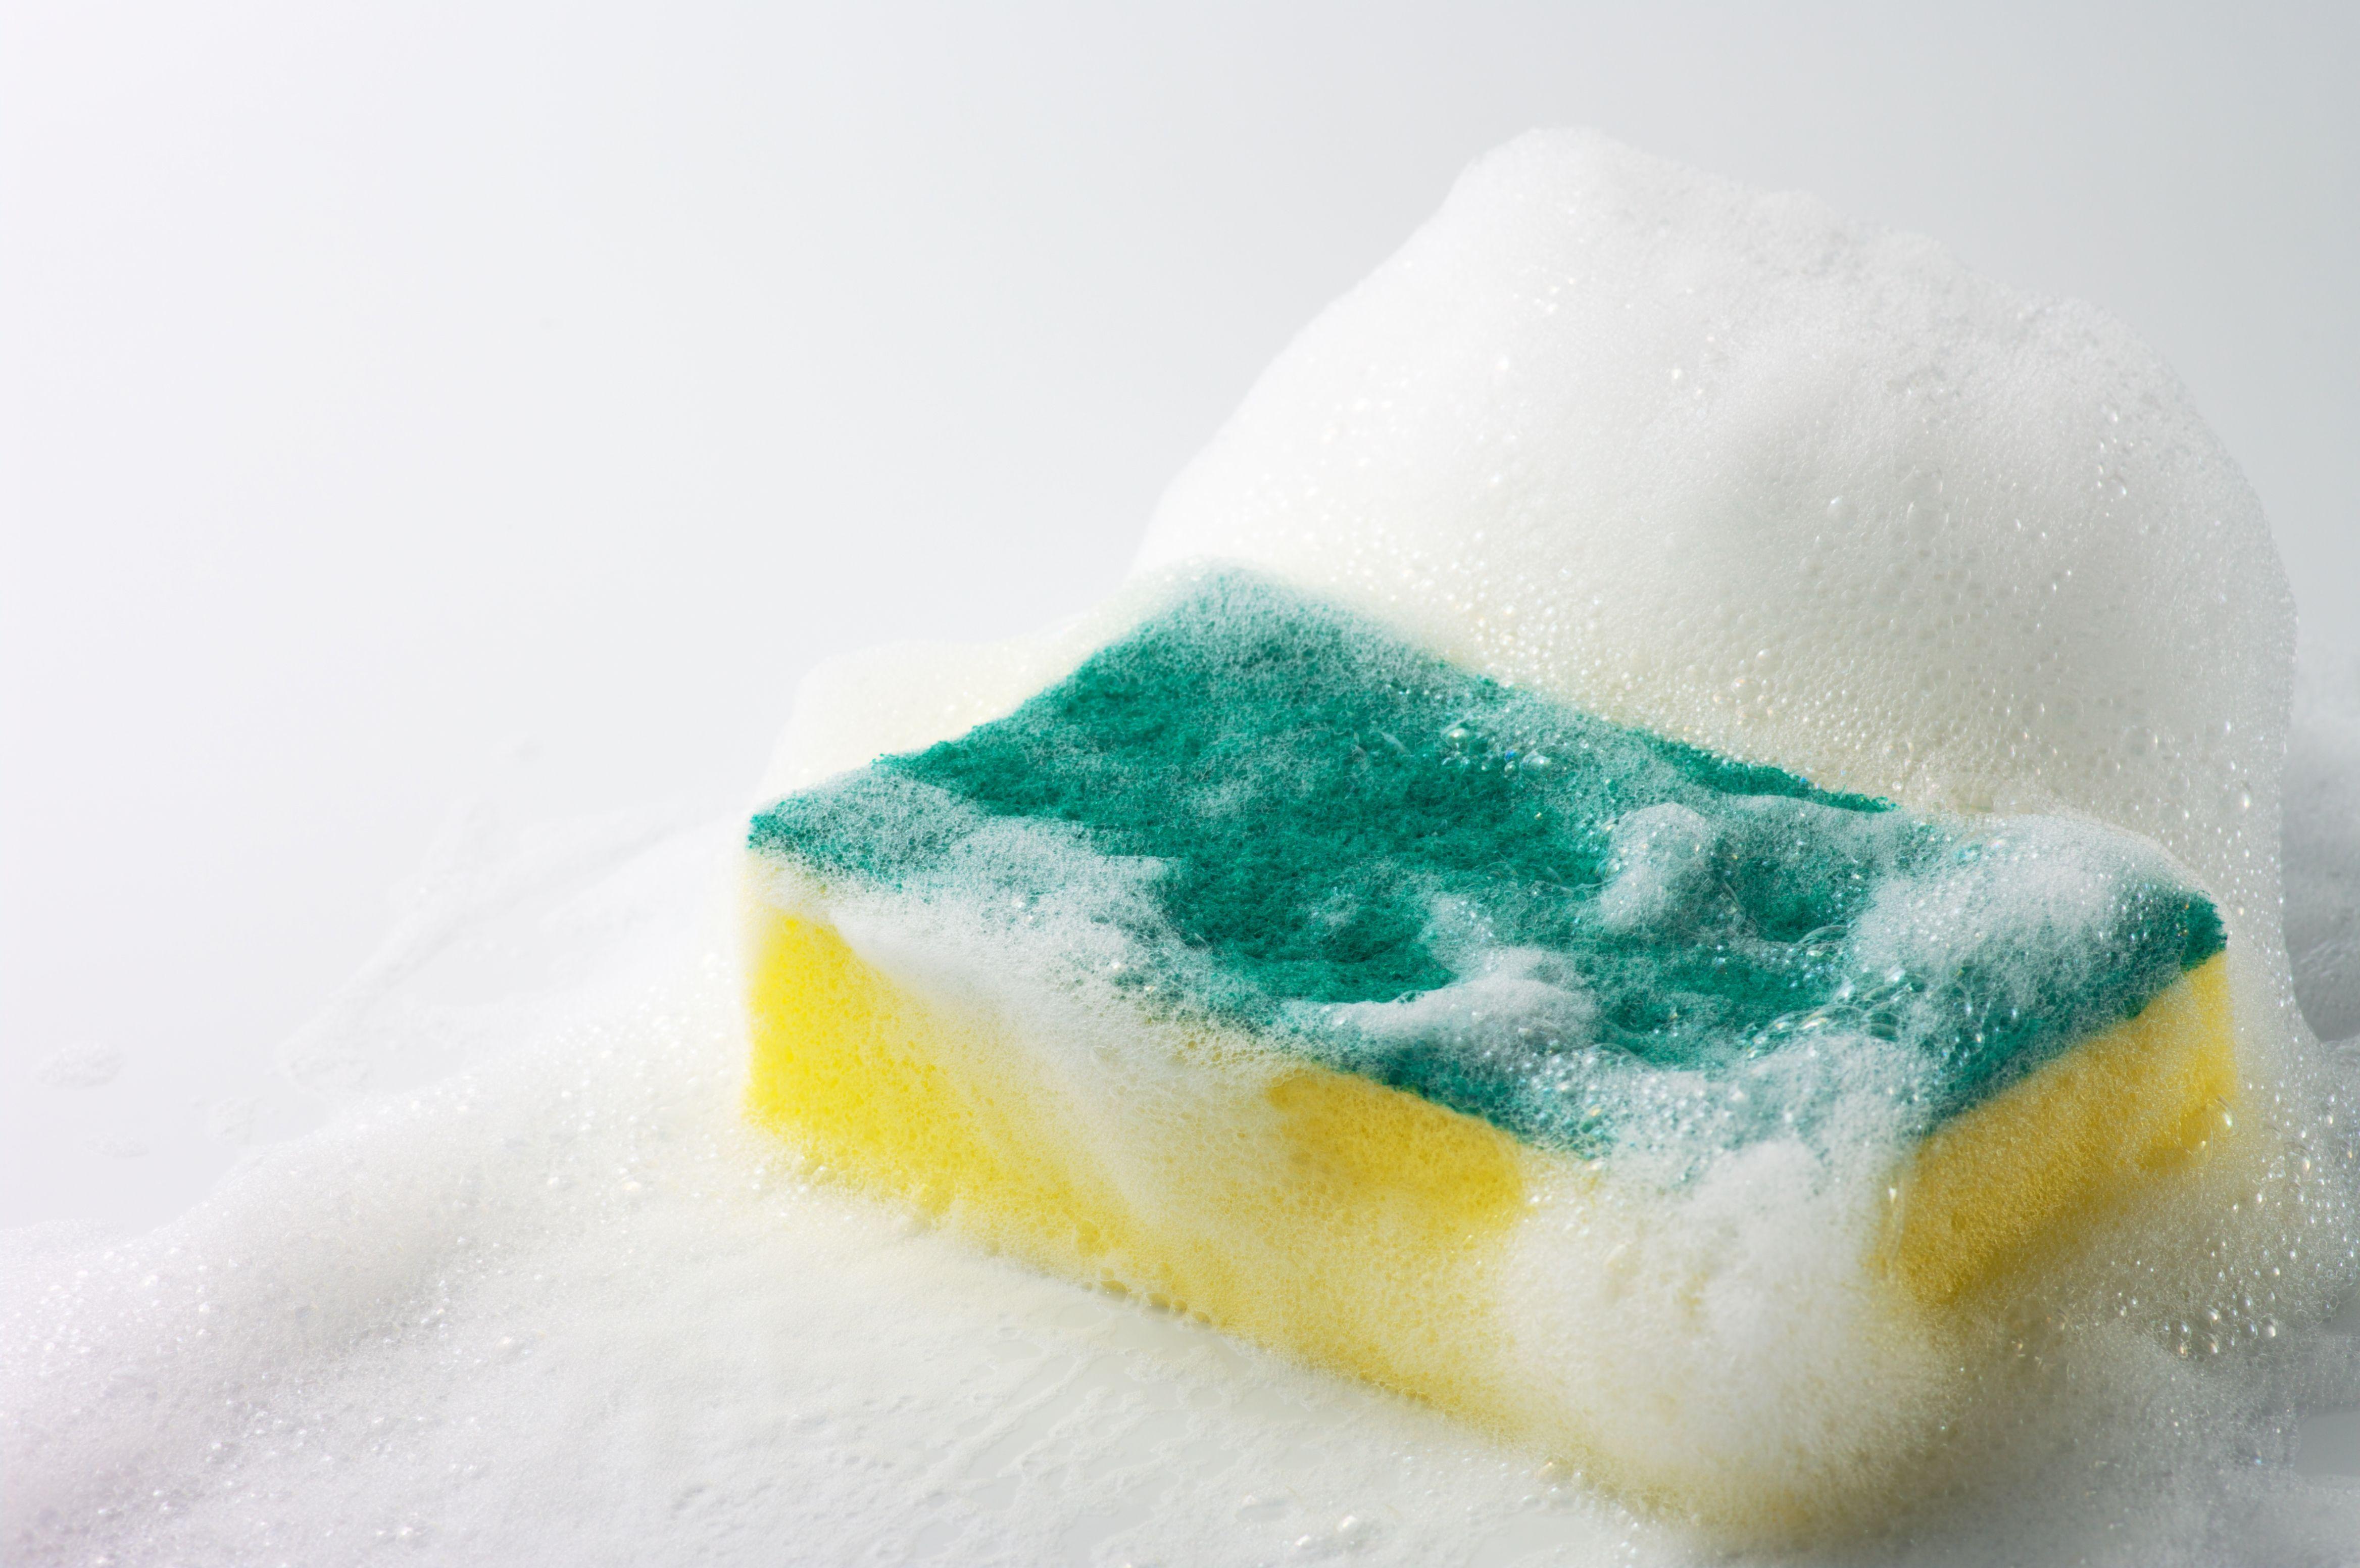 lathery sponge